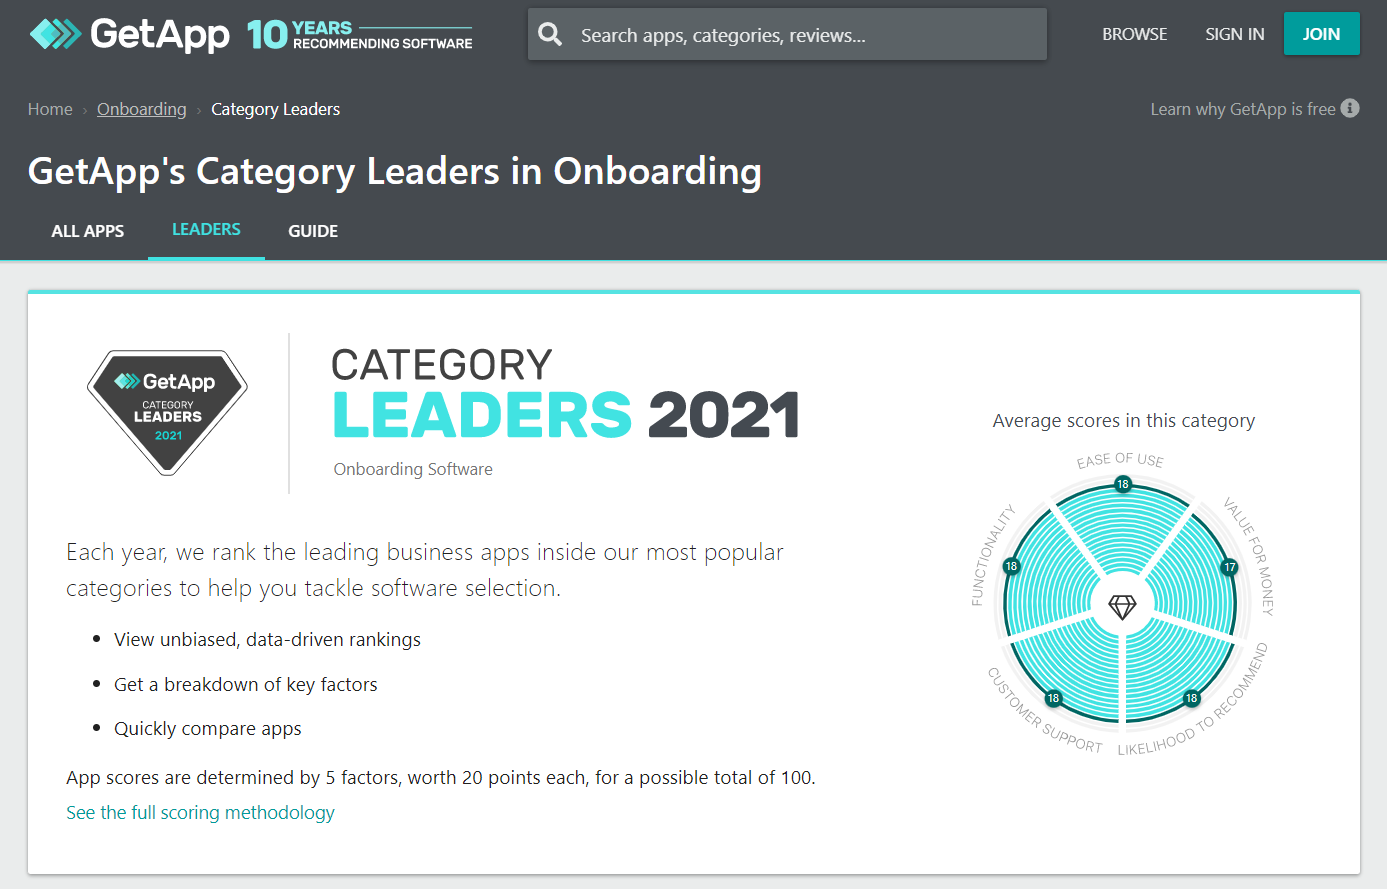 GetApp's Category Leaders in onboarding software